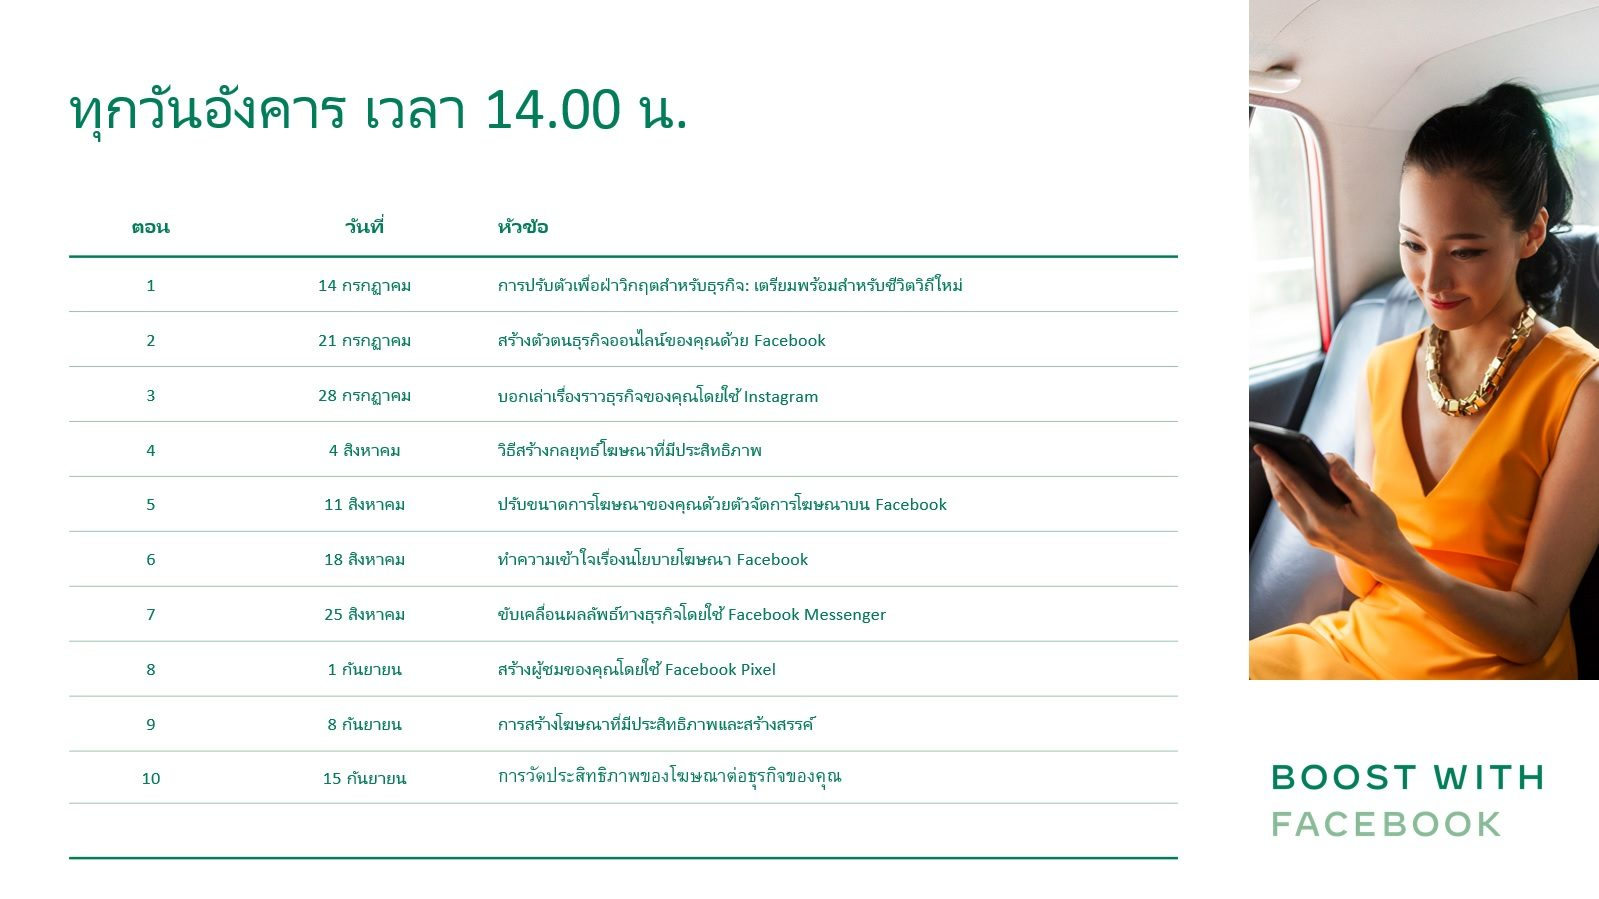 Facebook ประเทศไทย เปิดคอร์สออนไลน์อบรมฟรี ช่วยเหลือSMEไทย เร่งฟื้นฟูธุรกิจ เพิ่มทักษะดิจิทัล